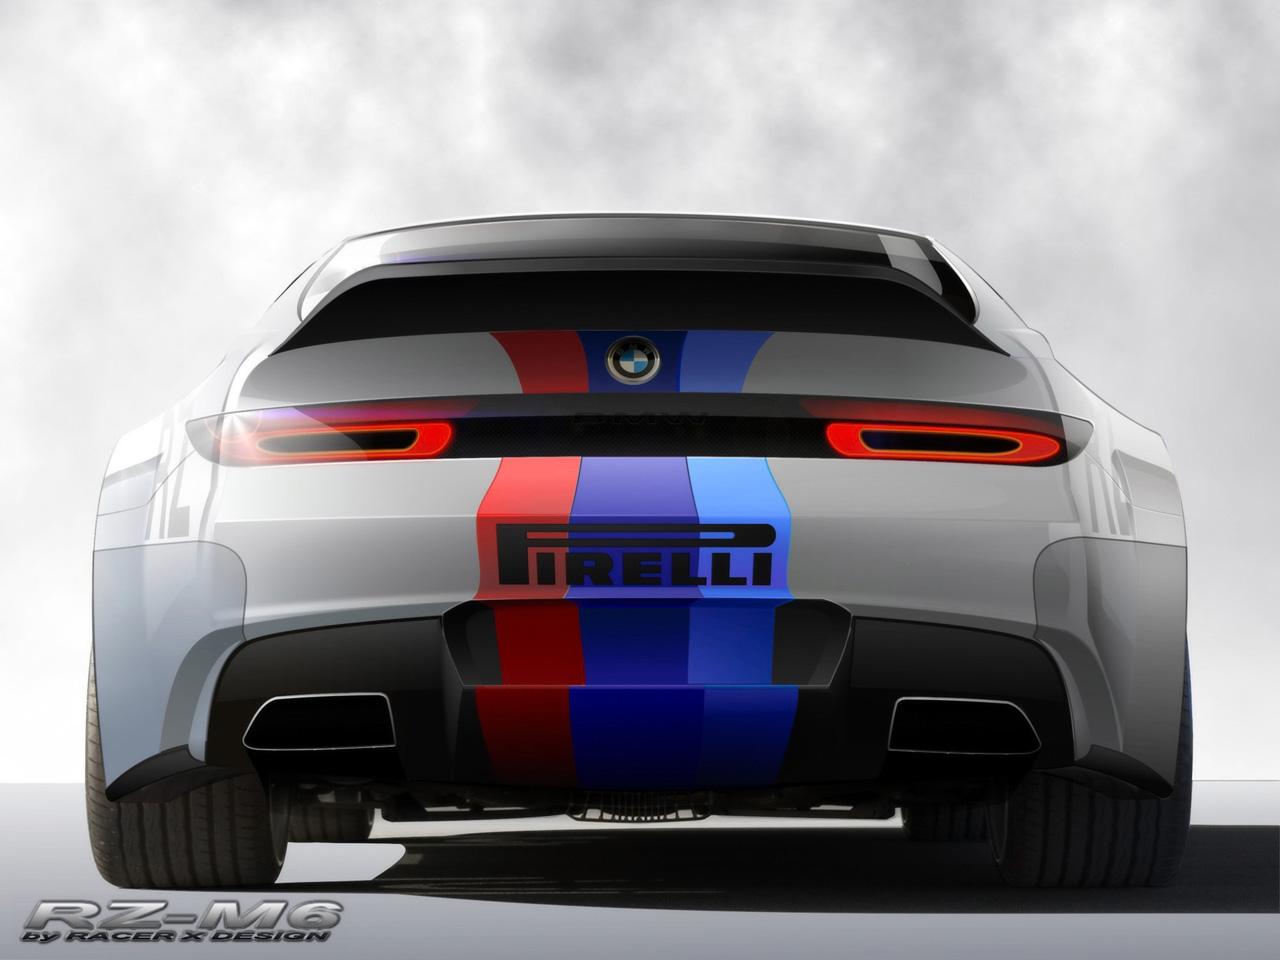 Racer X Design 2009 BMW RZ-M6 - autoevolution